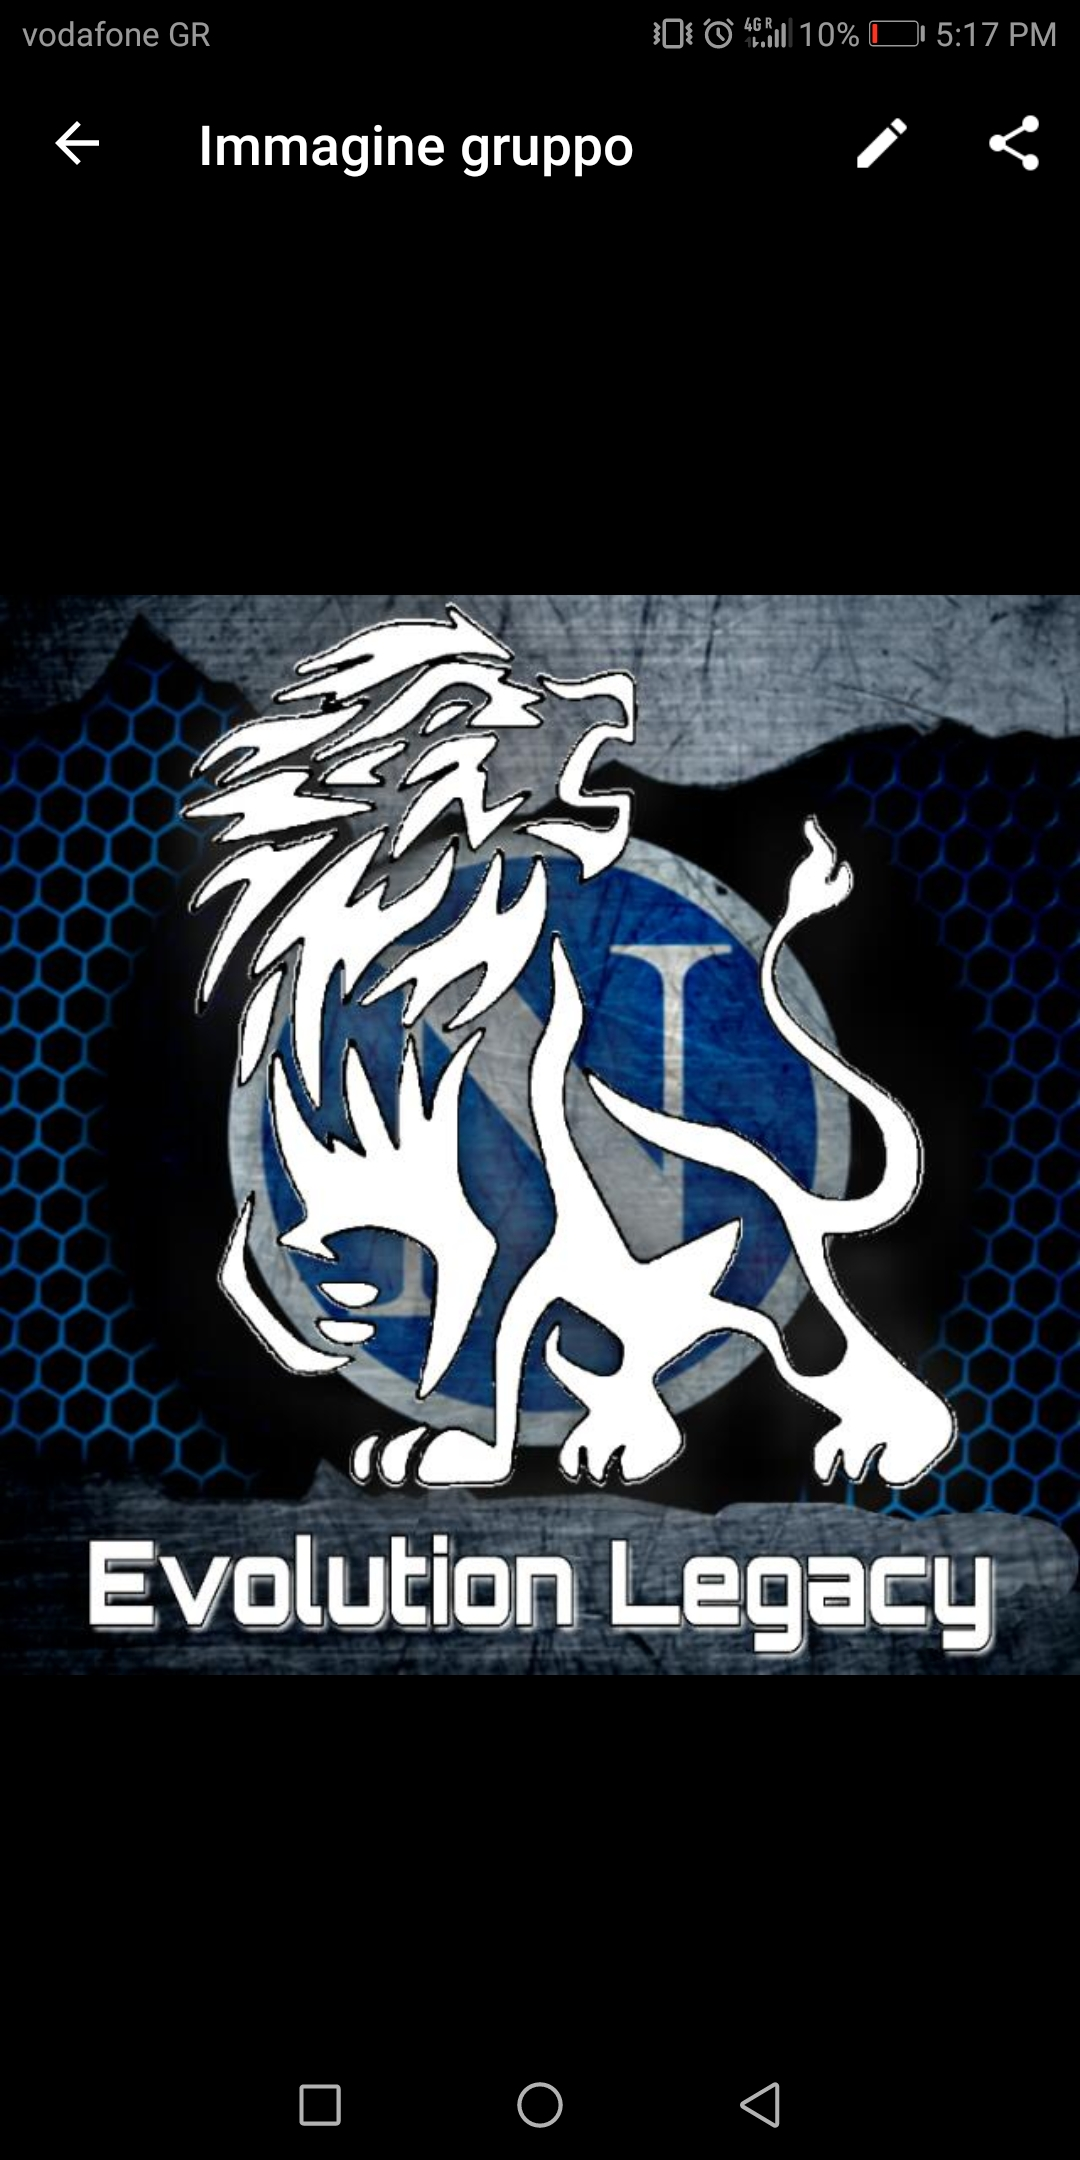 Evolution Legacy Napoli logo